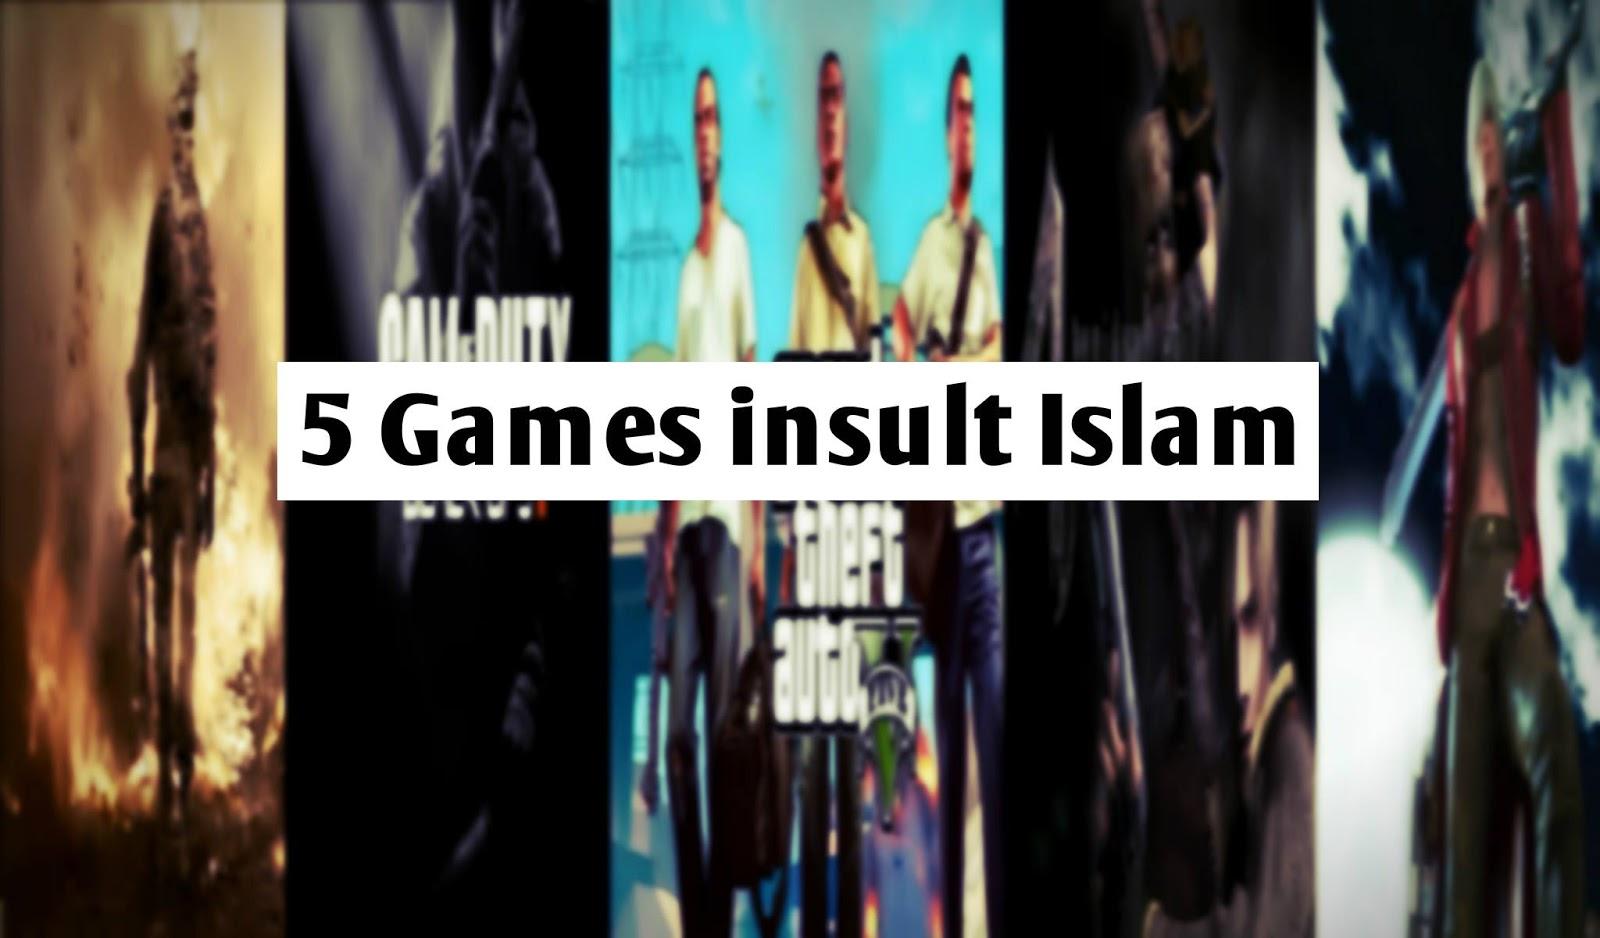 ٥ یاری کە سووکایەتی بە ئیسلام دەکات  – 5Games insult Islam